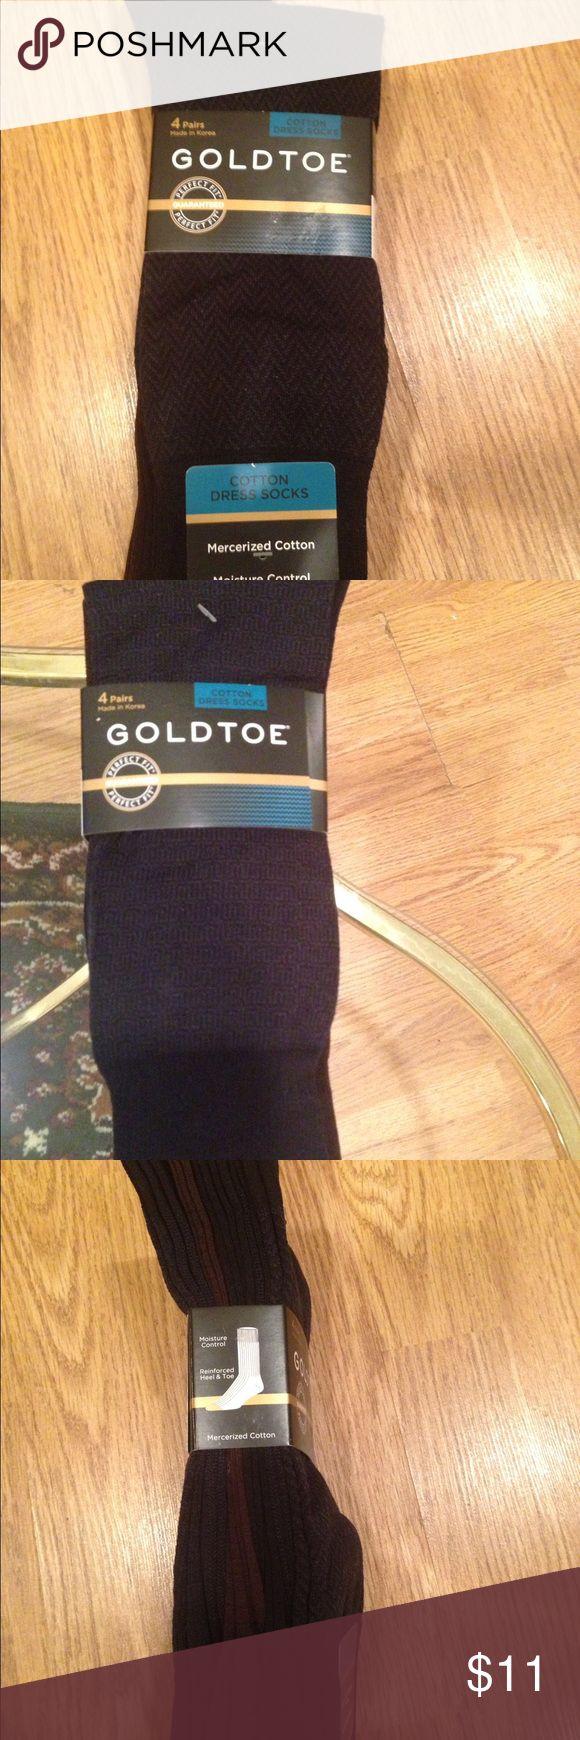 Men GoldToe Cotton Dress Socks Bundle of  Four. 4 - Pairs Of GoldToe Men Dress Sock.Perfect fit. Moisture Control, reinforced heel and toe. Different designs. Shoe size -6/12. Cotton,nylon and spandex blend. Gold Toe Underwear & Socks Dress Socks